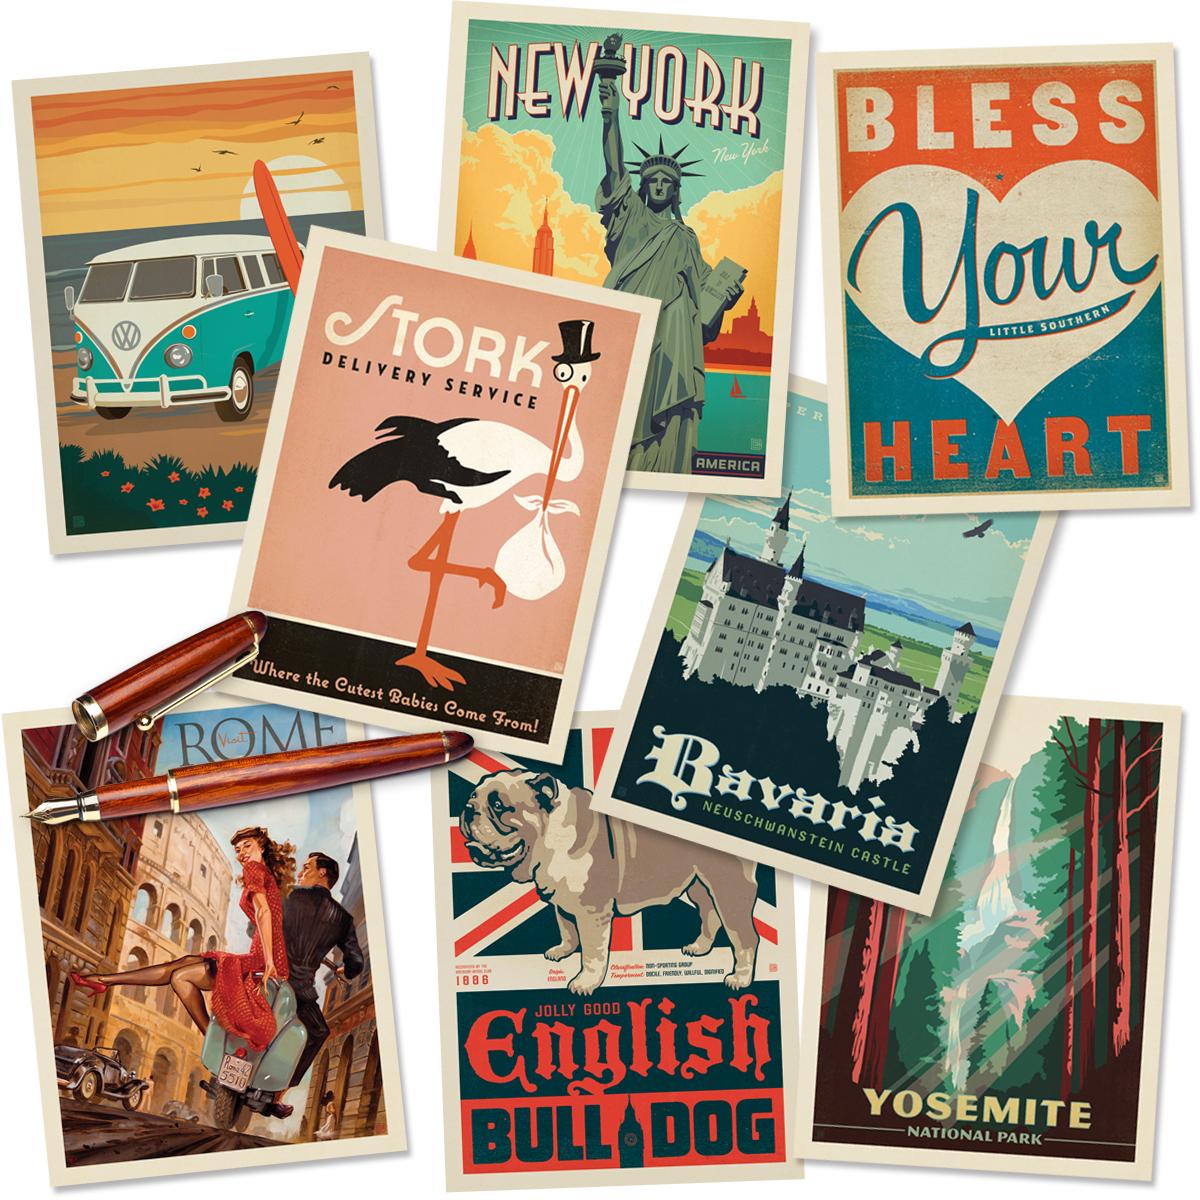 image regarding Printable Postcards Free named Cost-free Printable Postcard Template Literacy Designs